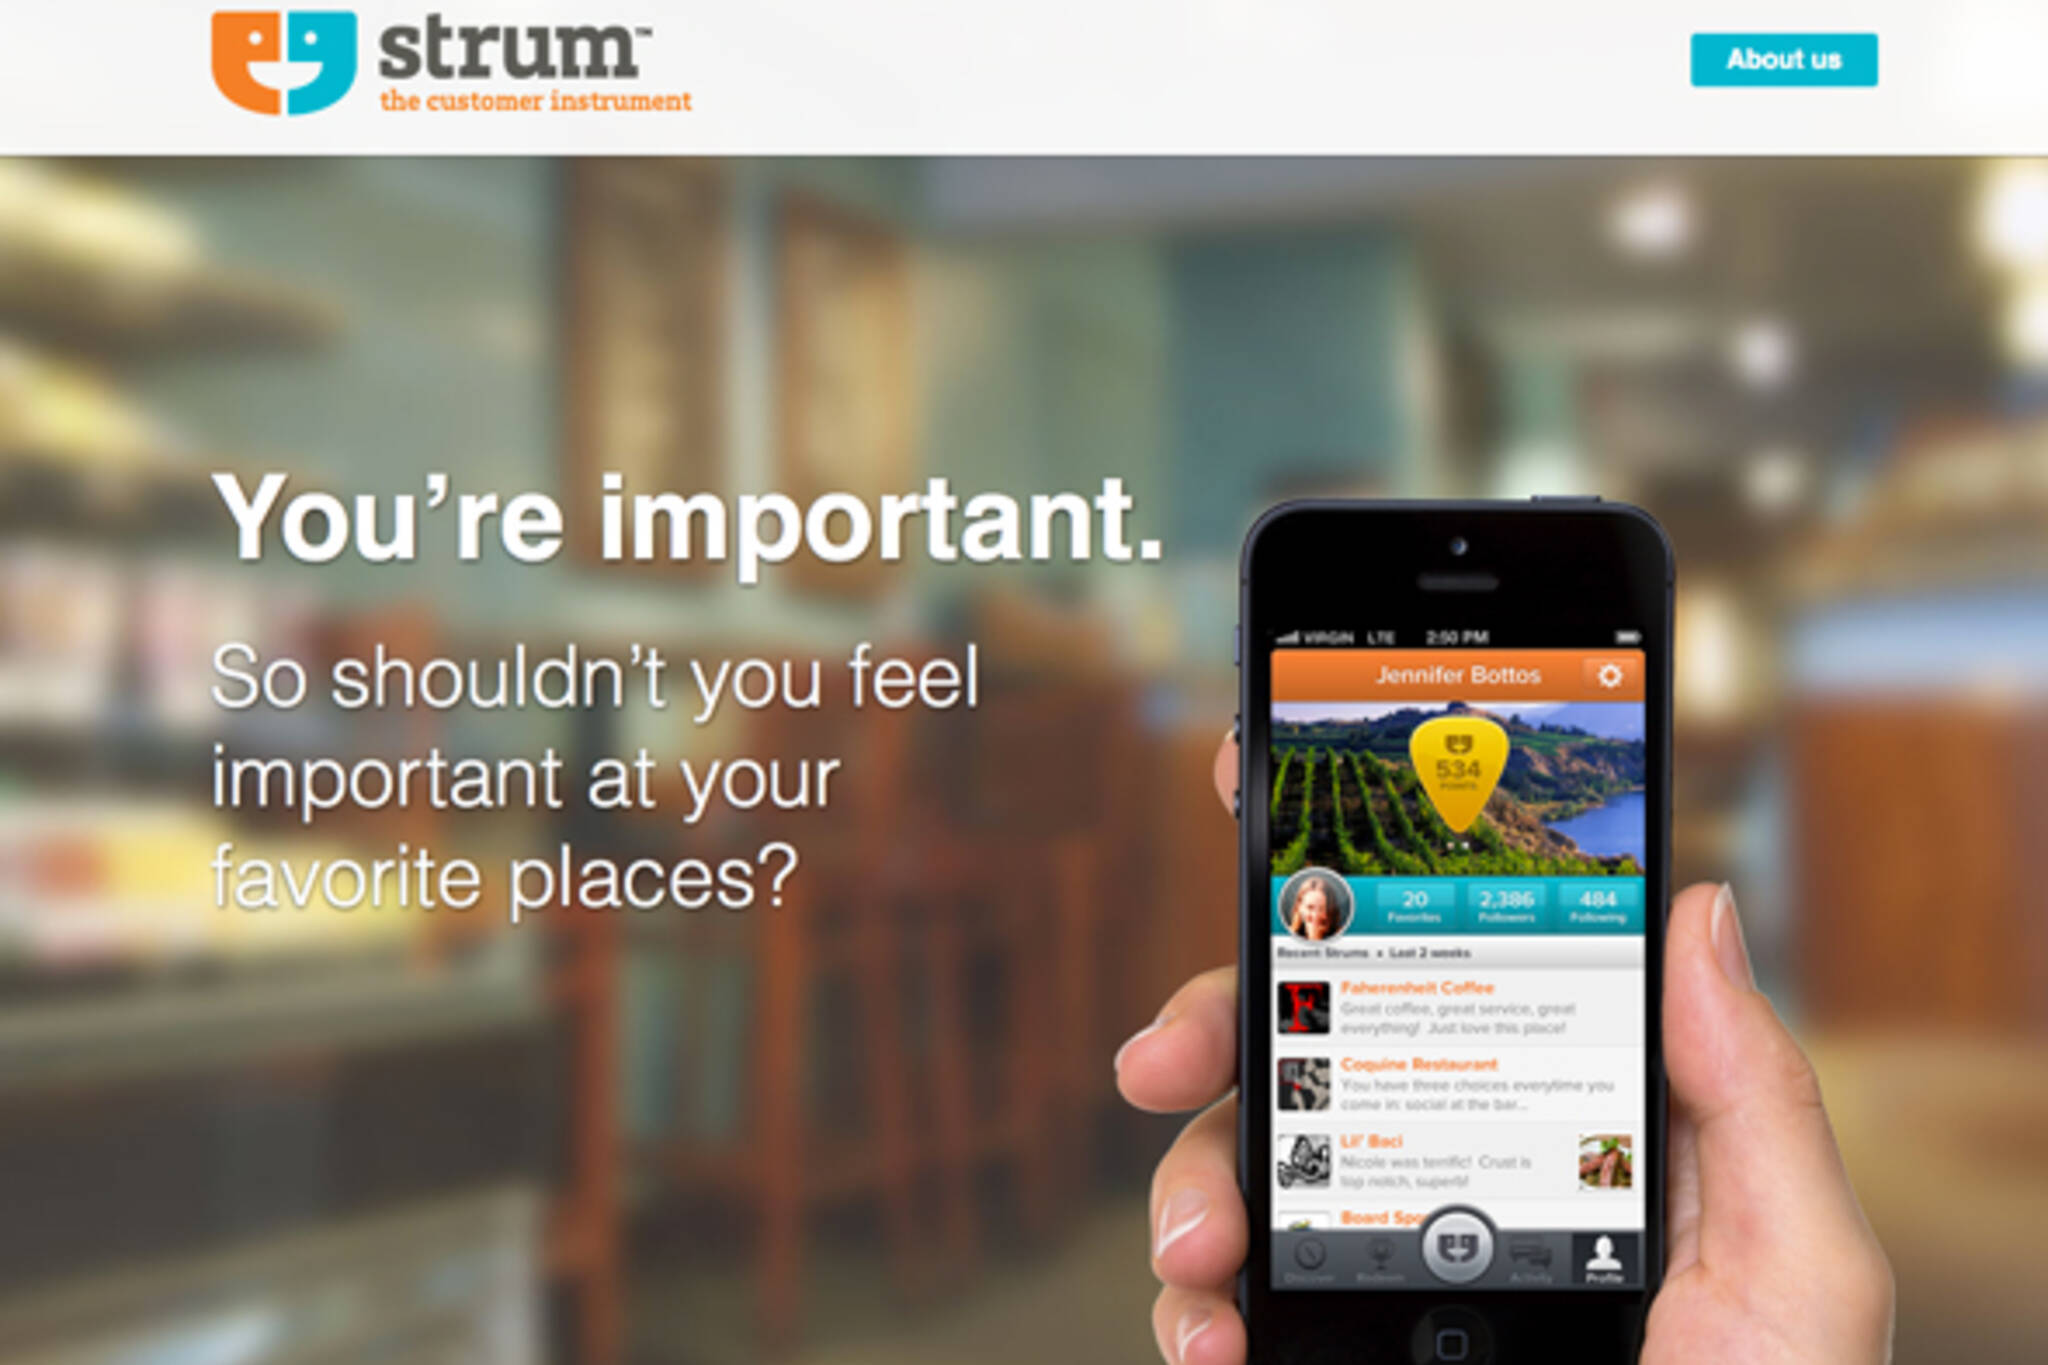 Strum app